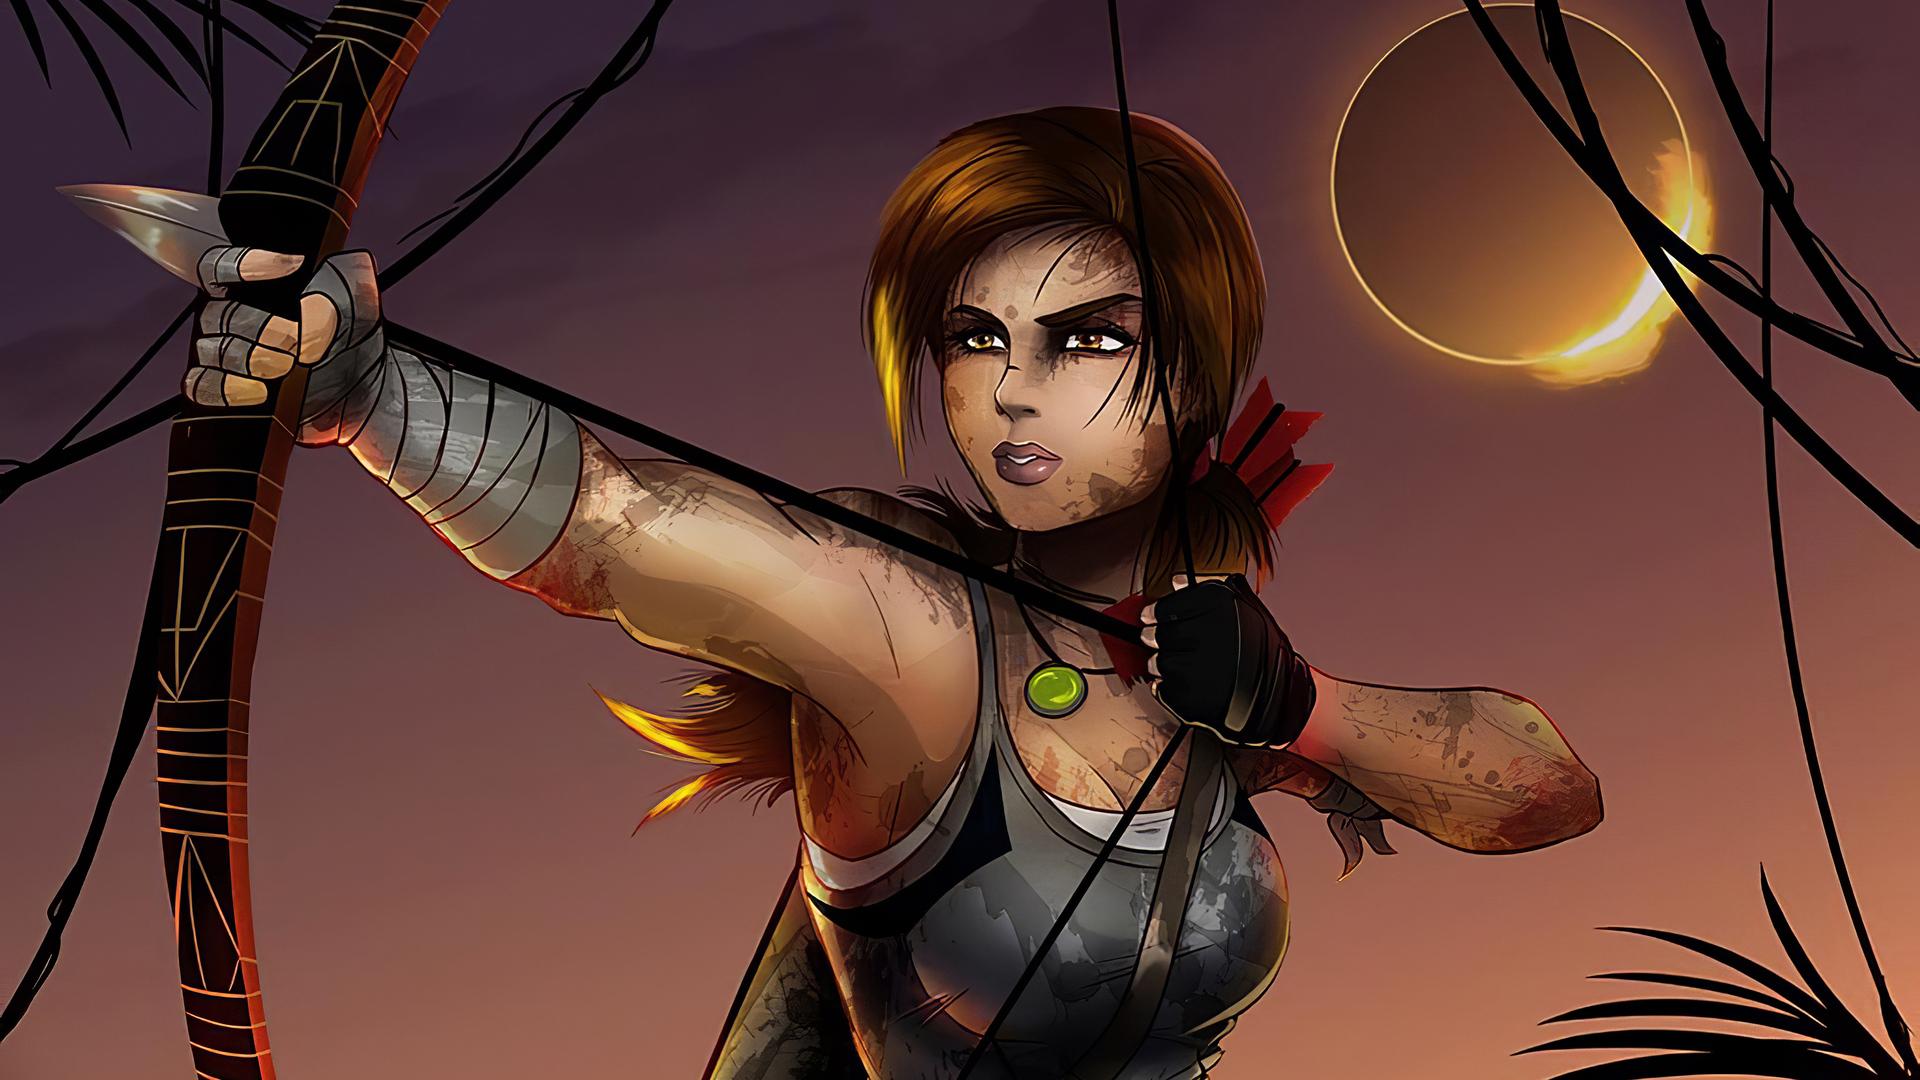 lara-croft-shadow-of-the-tomb-raider-artwork-4k-j7.jpg